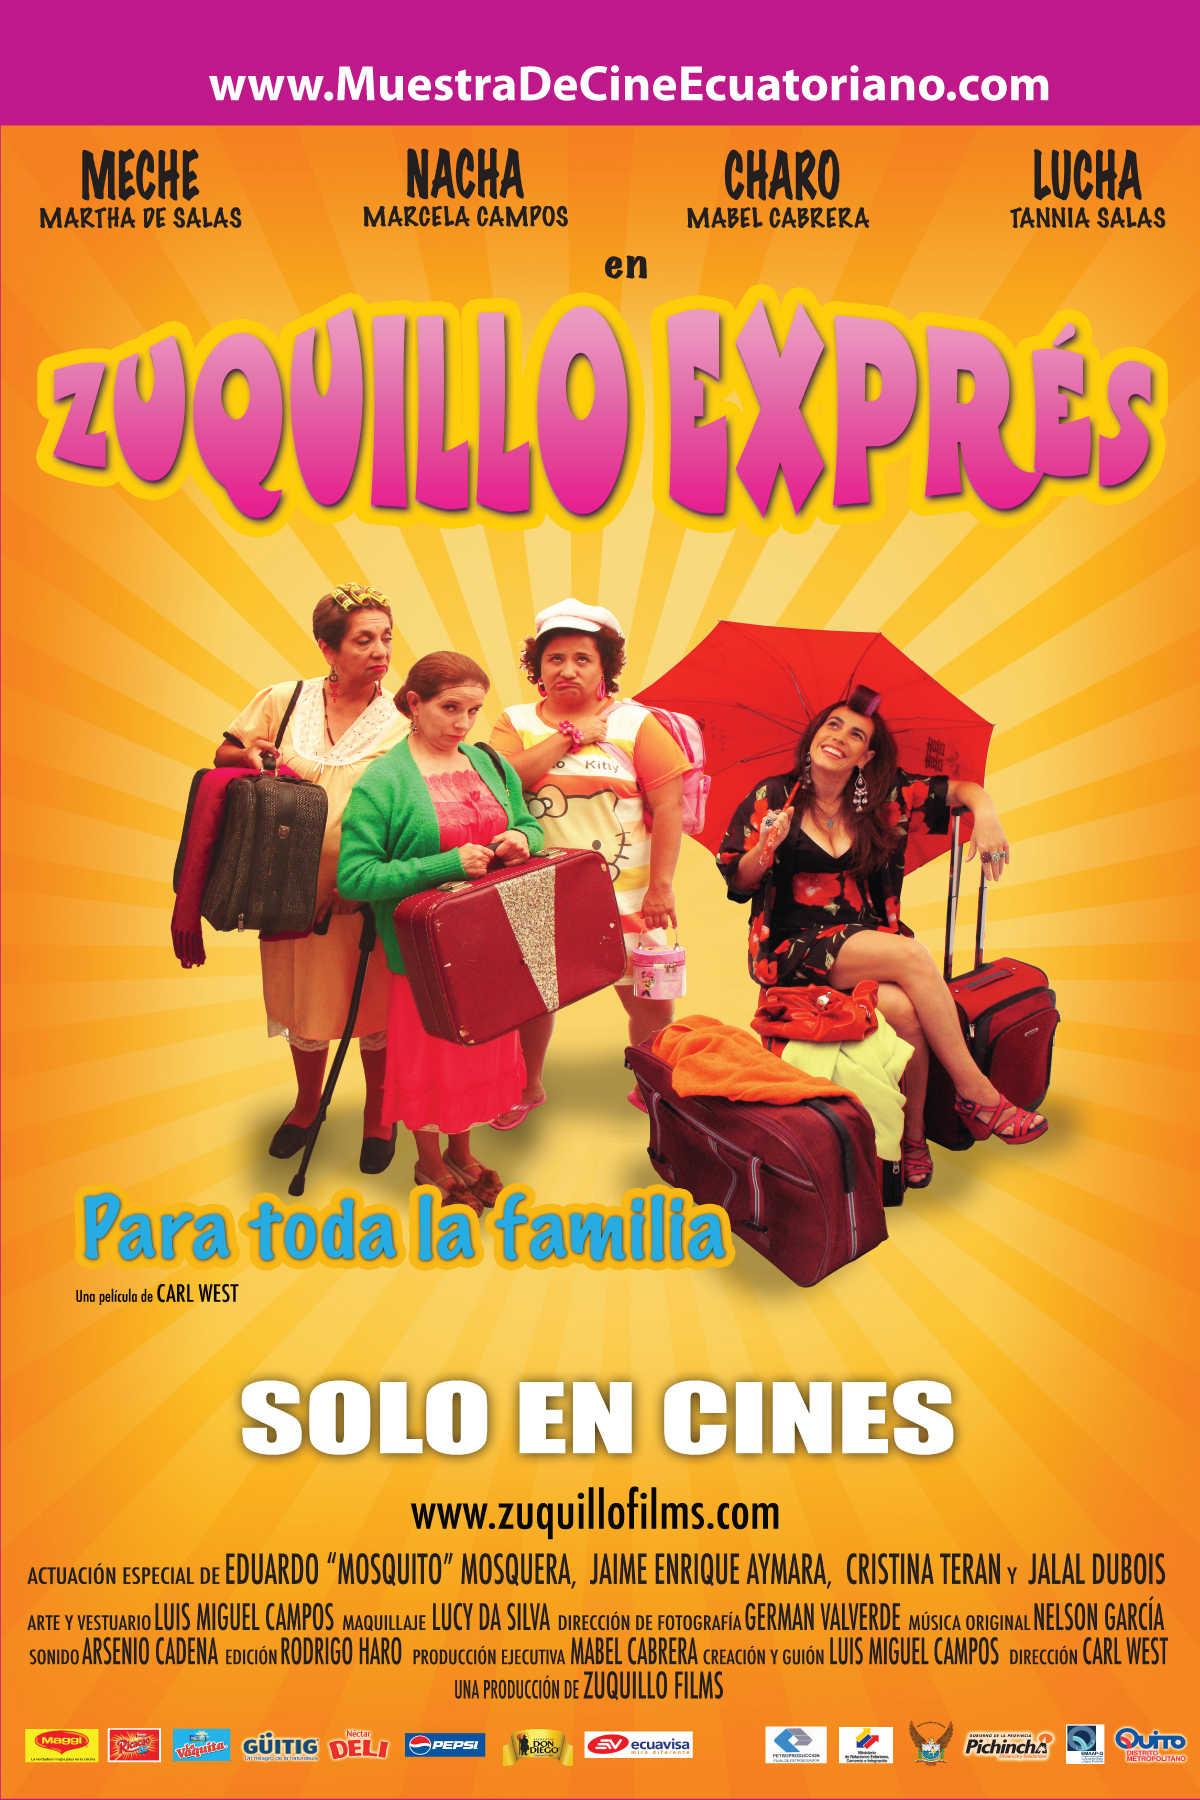 ZUQUILLO EXPRESS | The Zuquillo Express